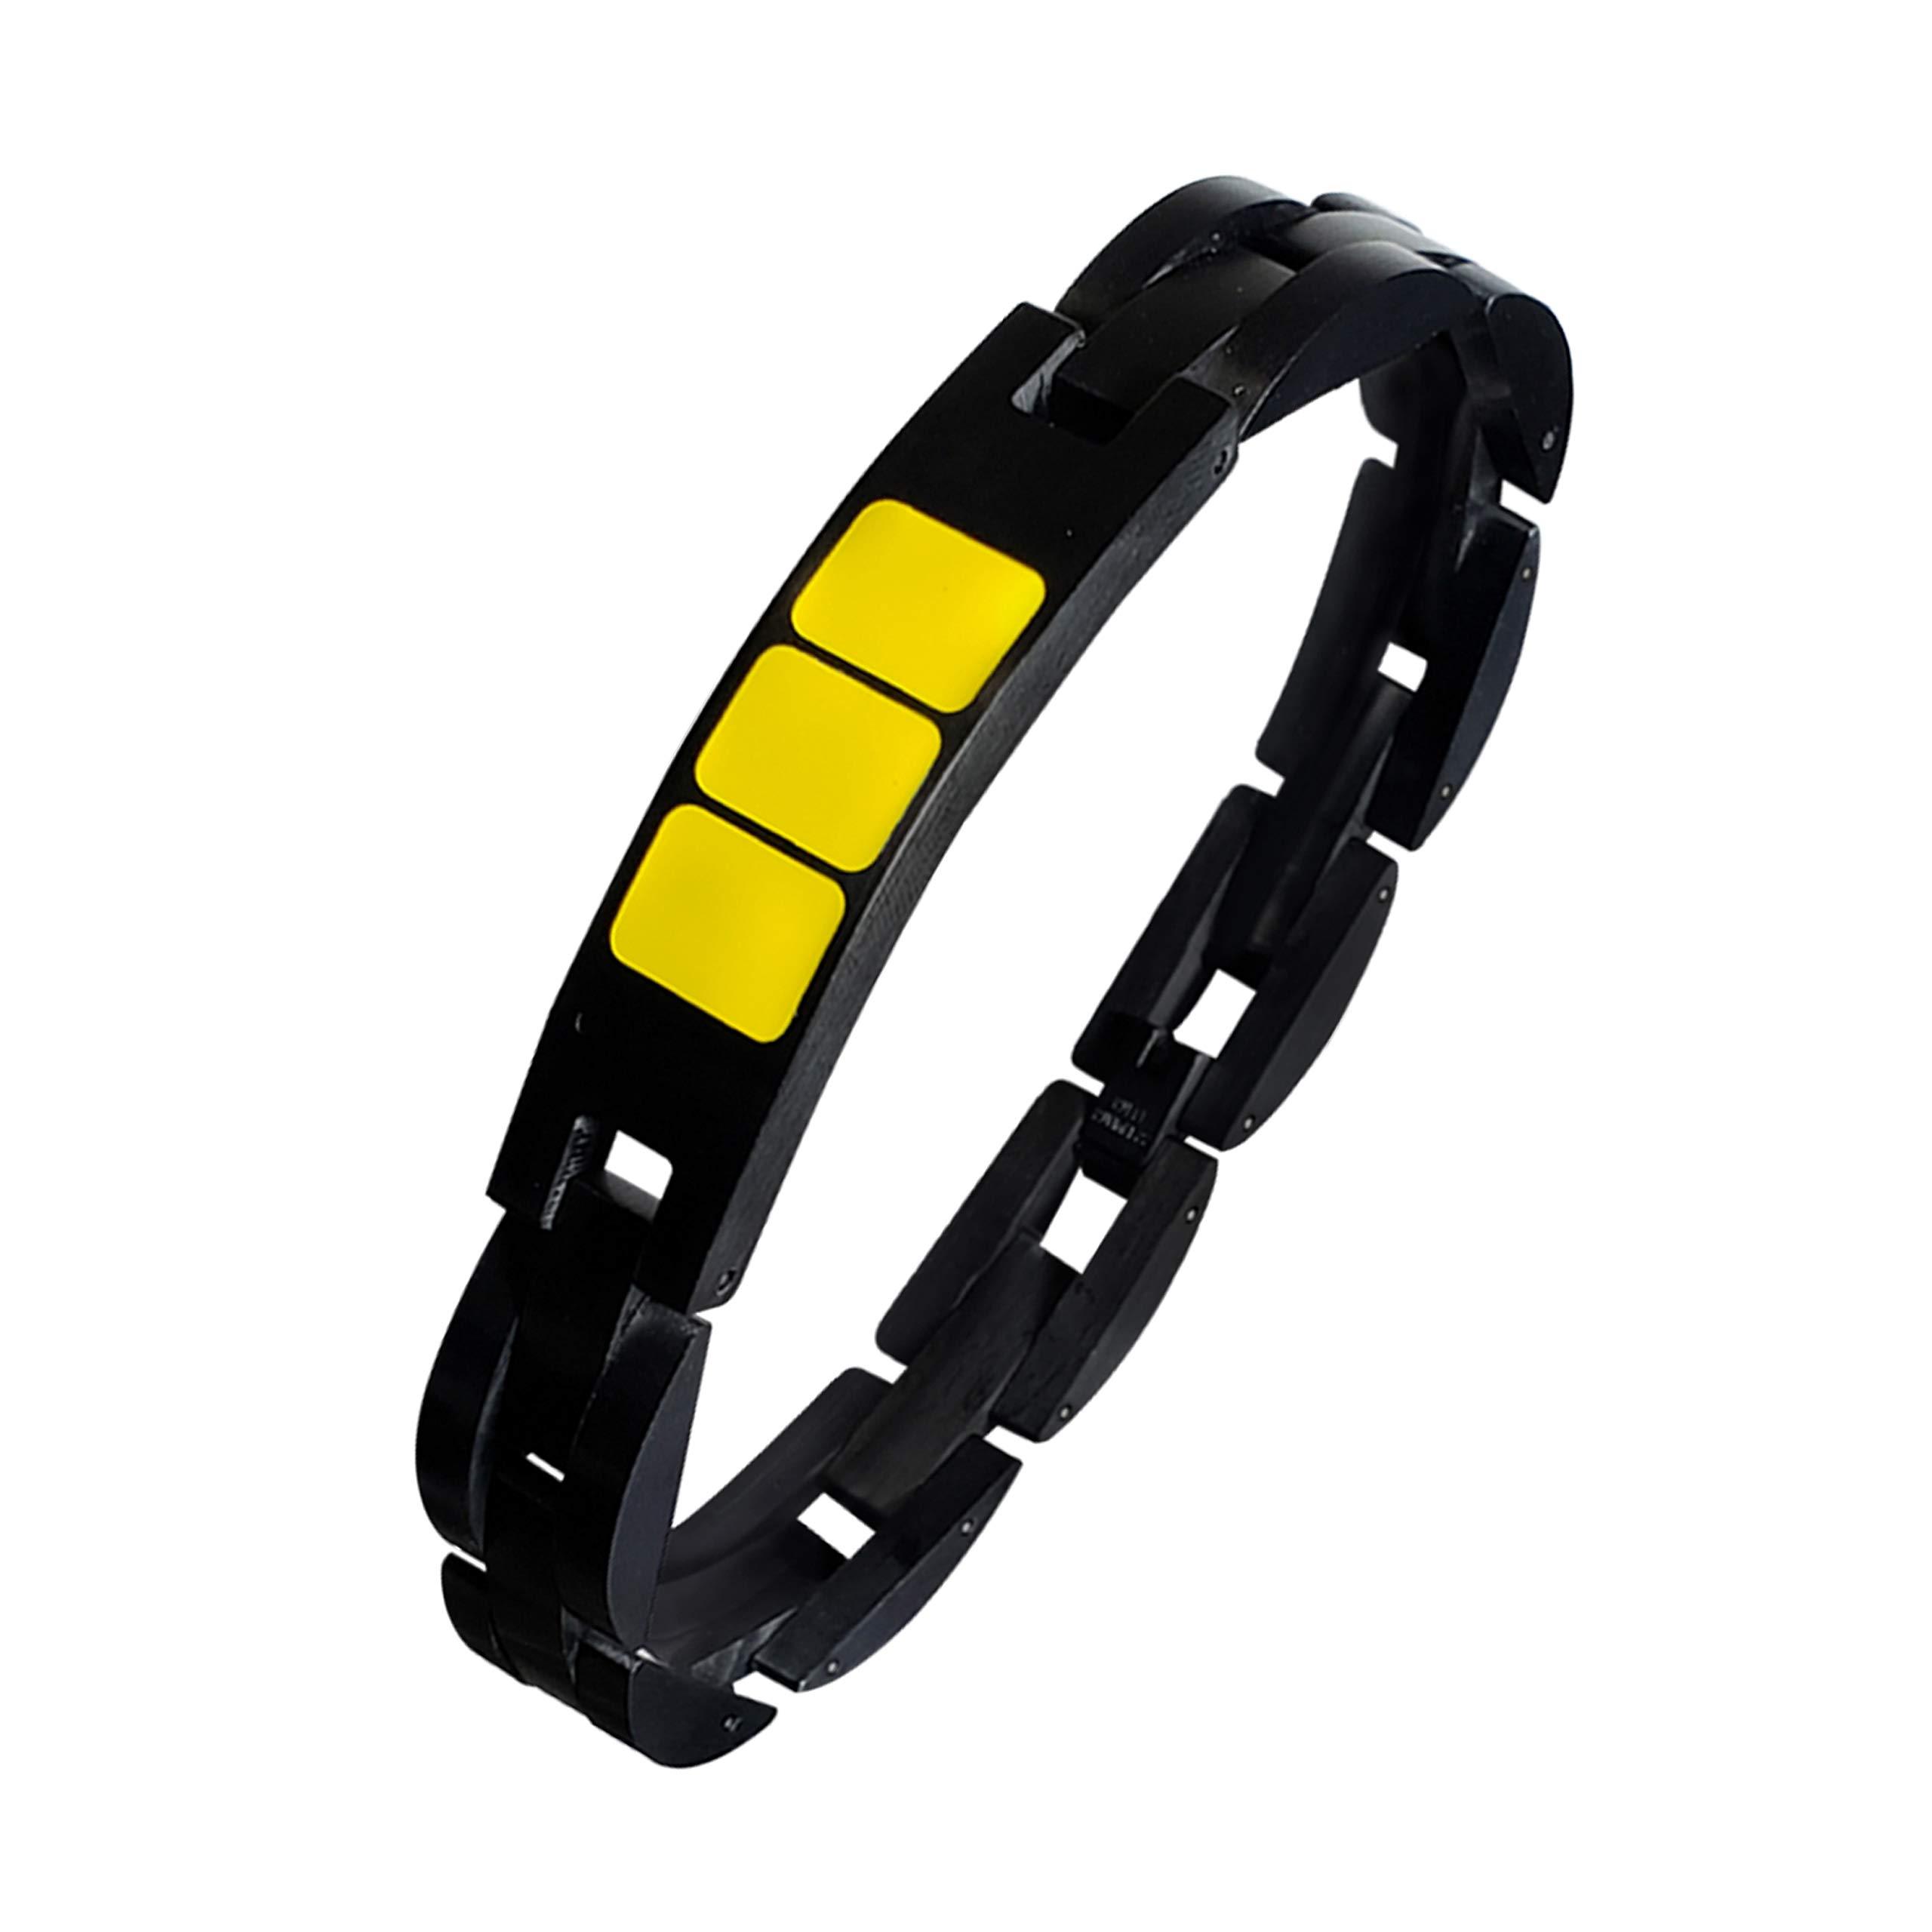 Aviation Pilot Bracelet – Black Matte Stainless Steel - Handmade Paint – Water/Dustproof - Adjustable Size Jewelry - Gift Ready Package - Perfect Airplane Bracelet!